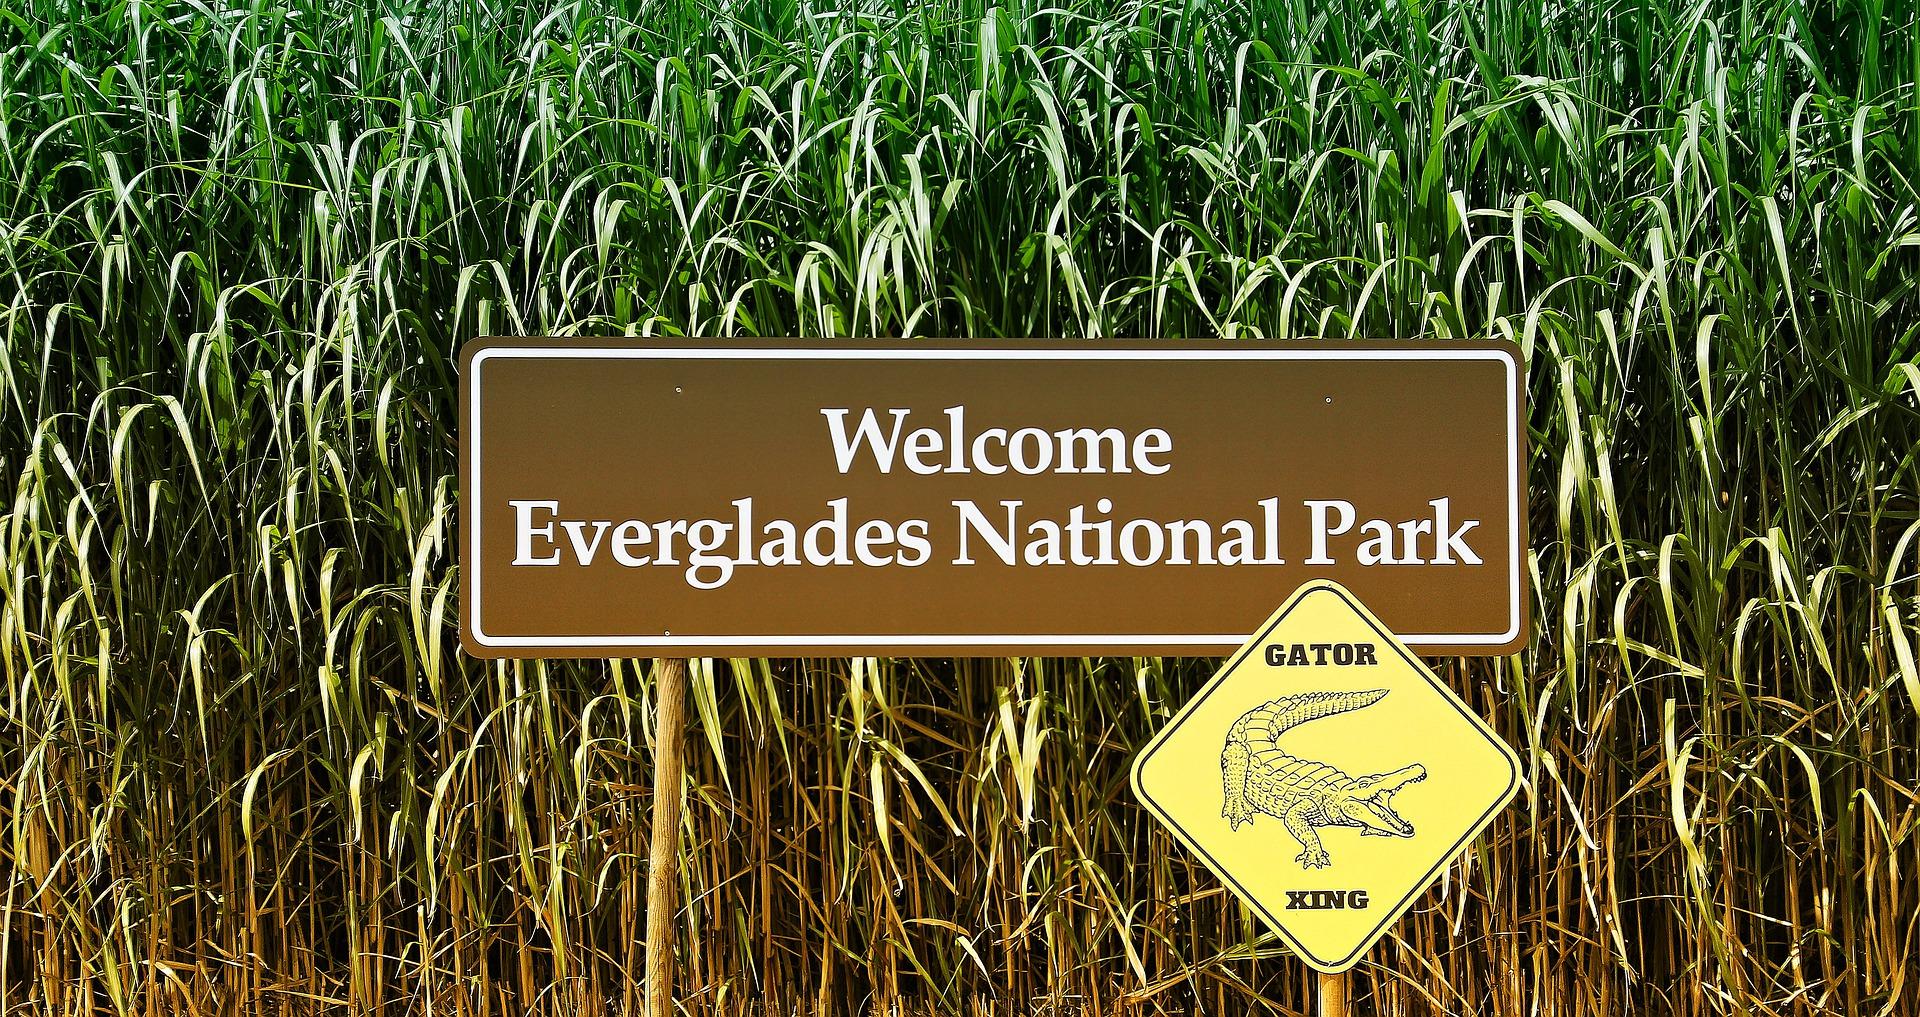 znak Everglades National Park